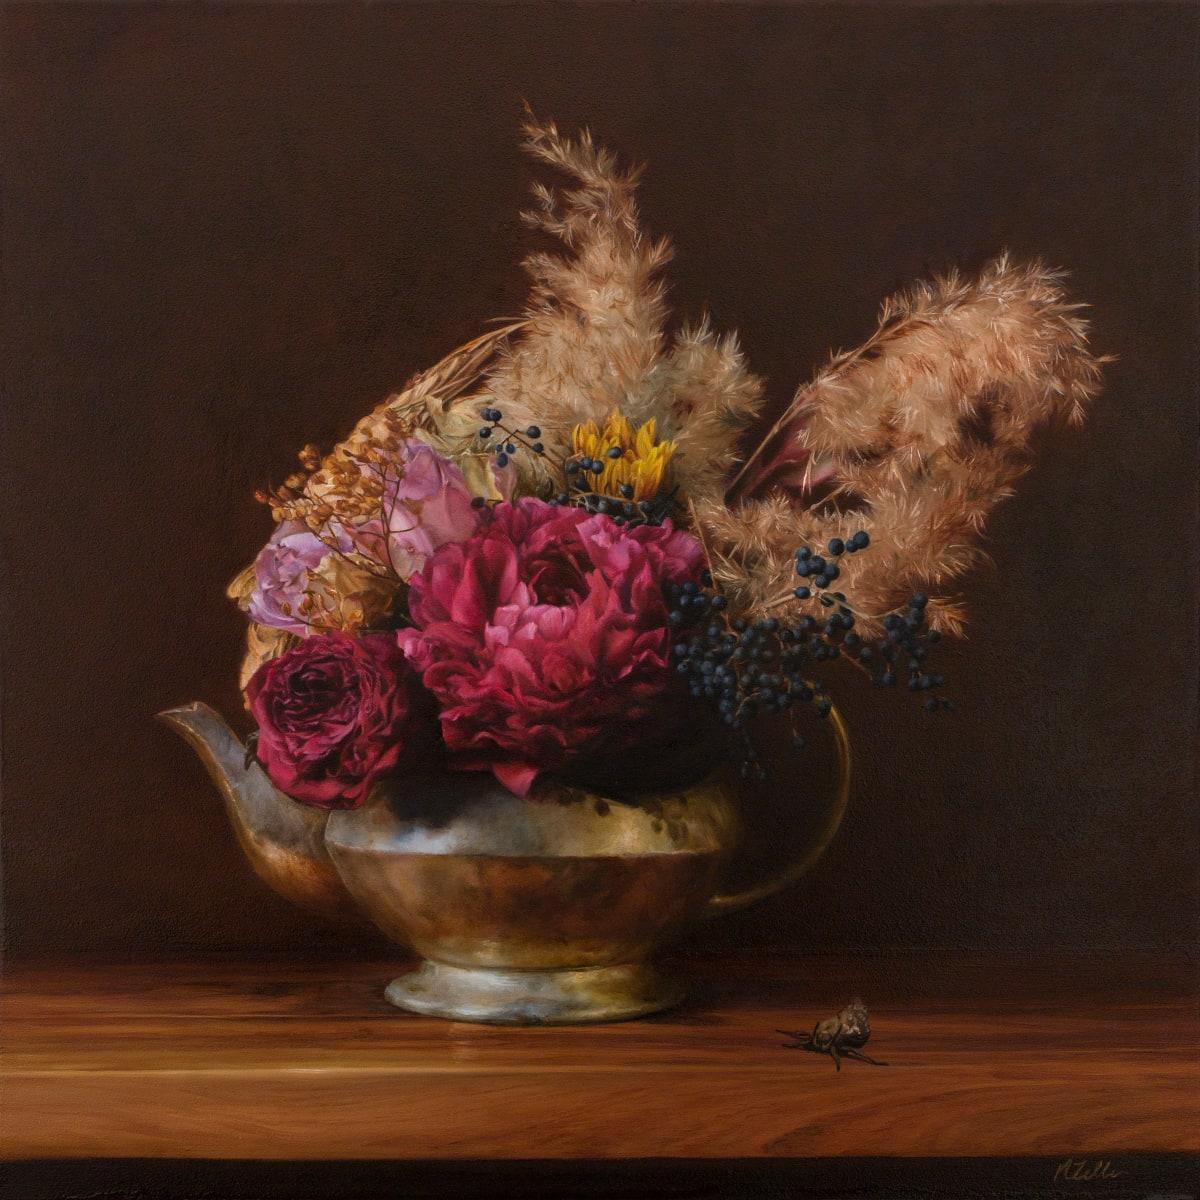 Carma, still life no.1 by Narelle Zeller